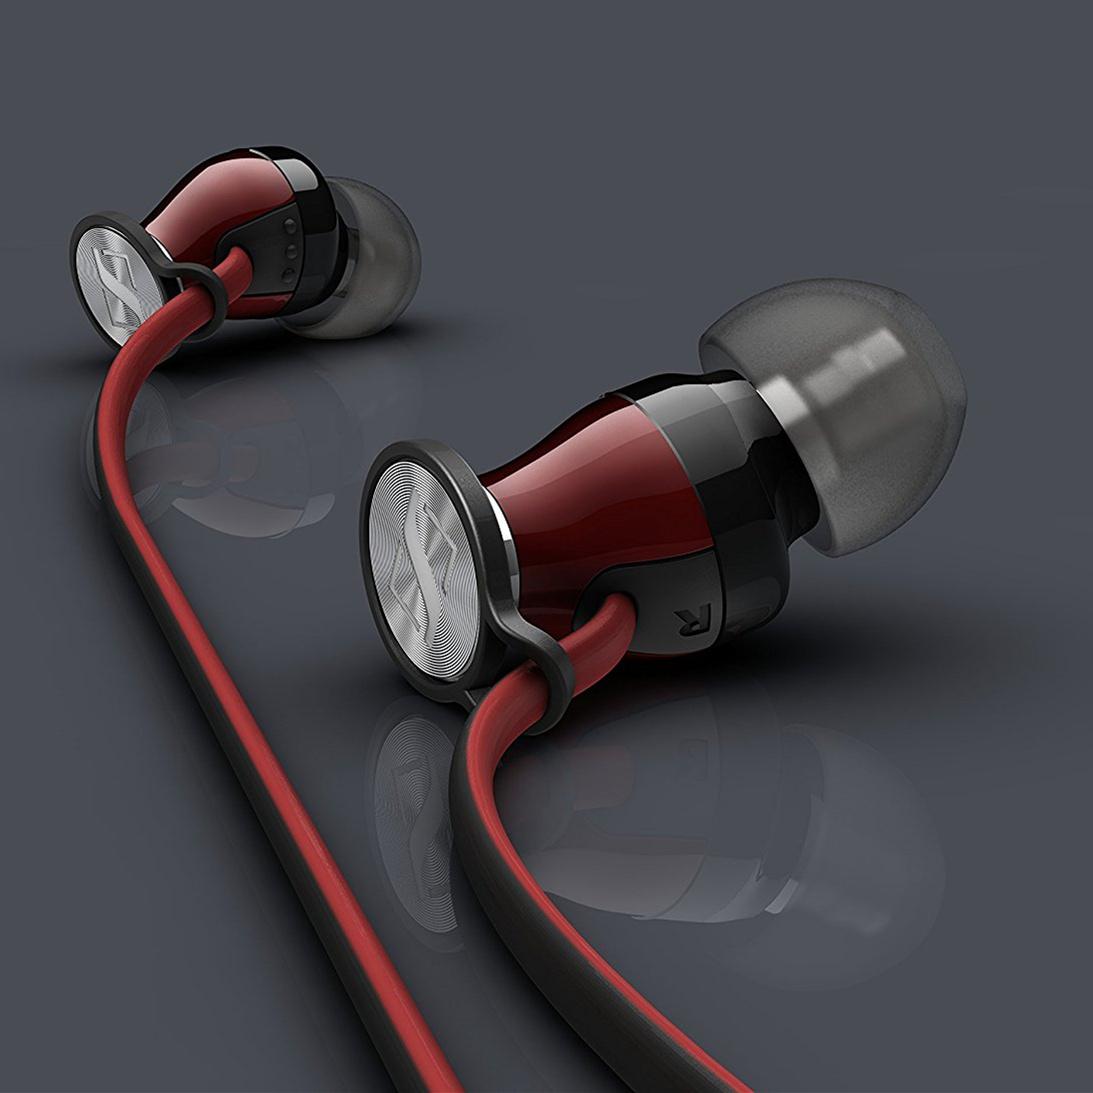 Sennheiser Momentum In-Ear入耳式耳机 适合iPhone/iPod/iPad